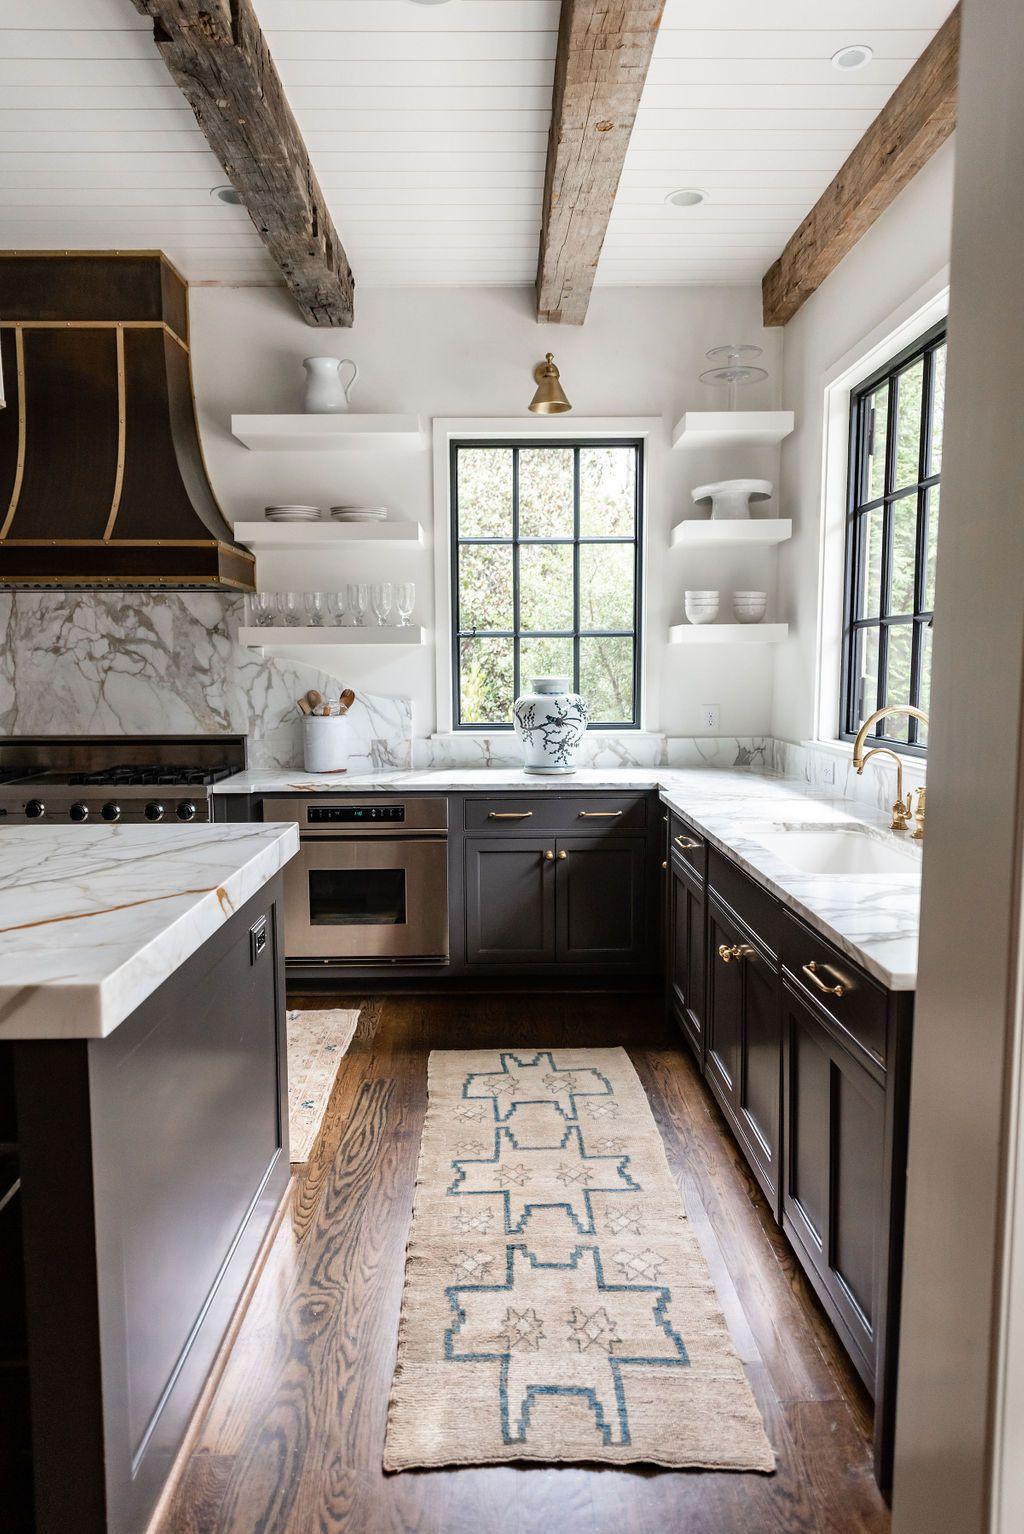 Kitchen Renovation Before And After Kitchen Design Kitchen